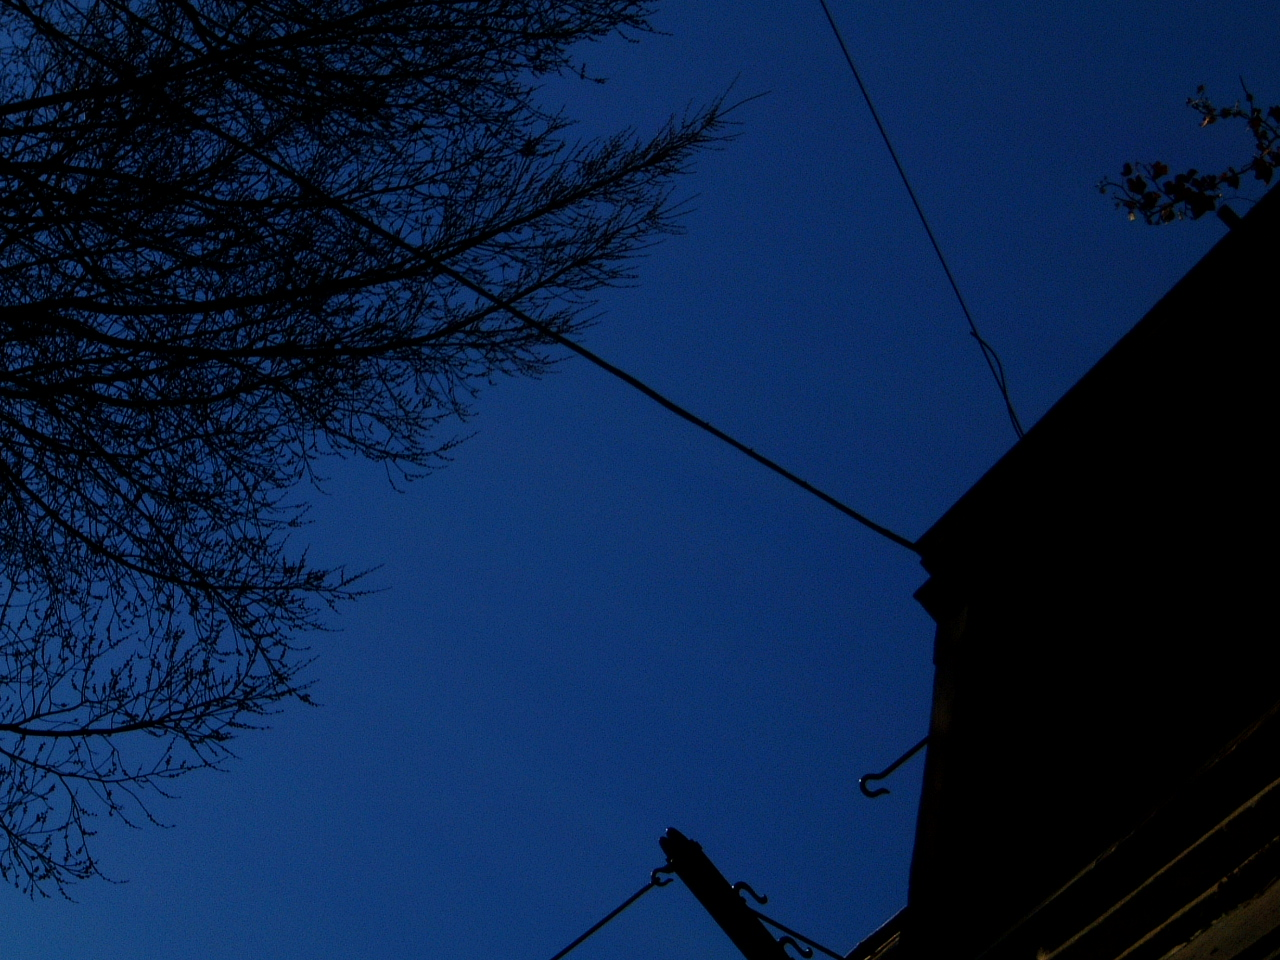 maartent architecture exteriors night amsterdam skyline tree silhouette house